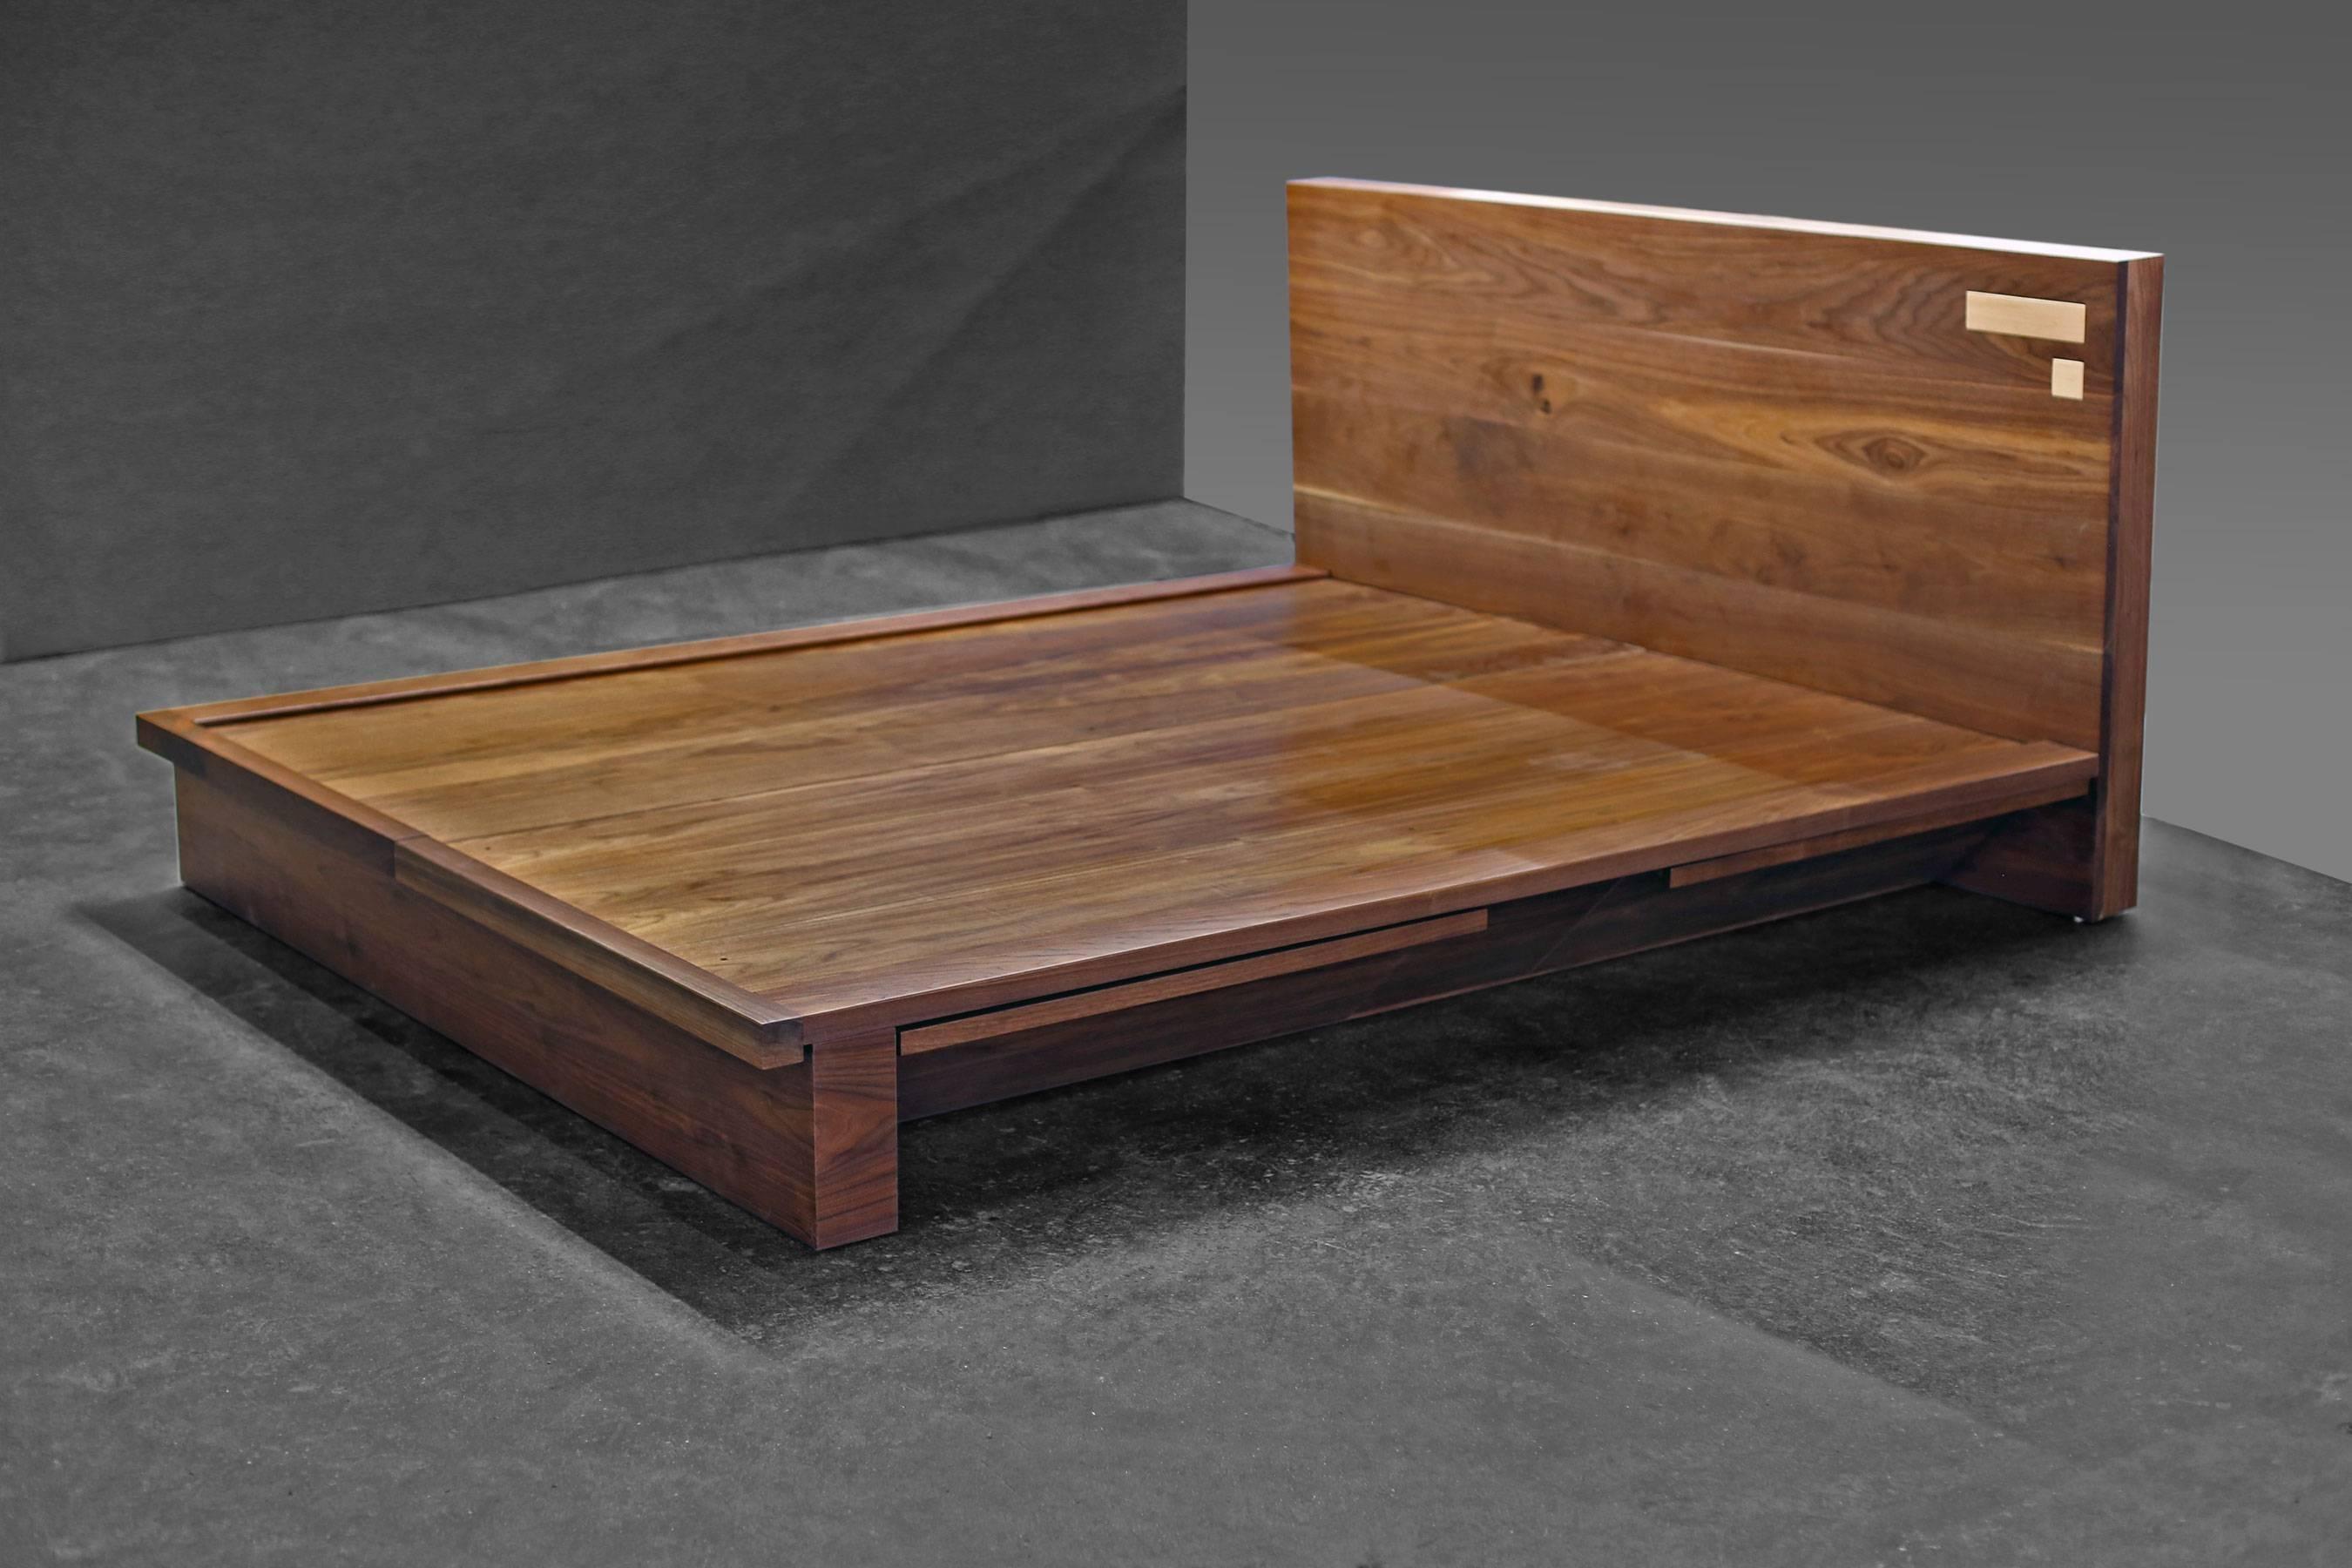 Shimna Liffey Platform Bed With Hidden